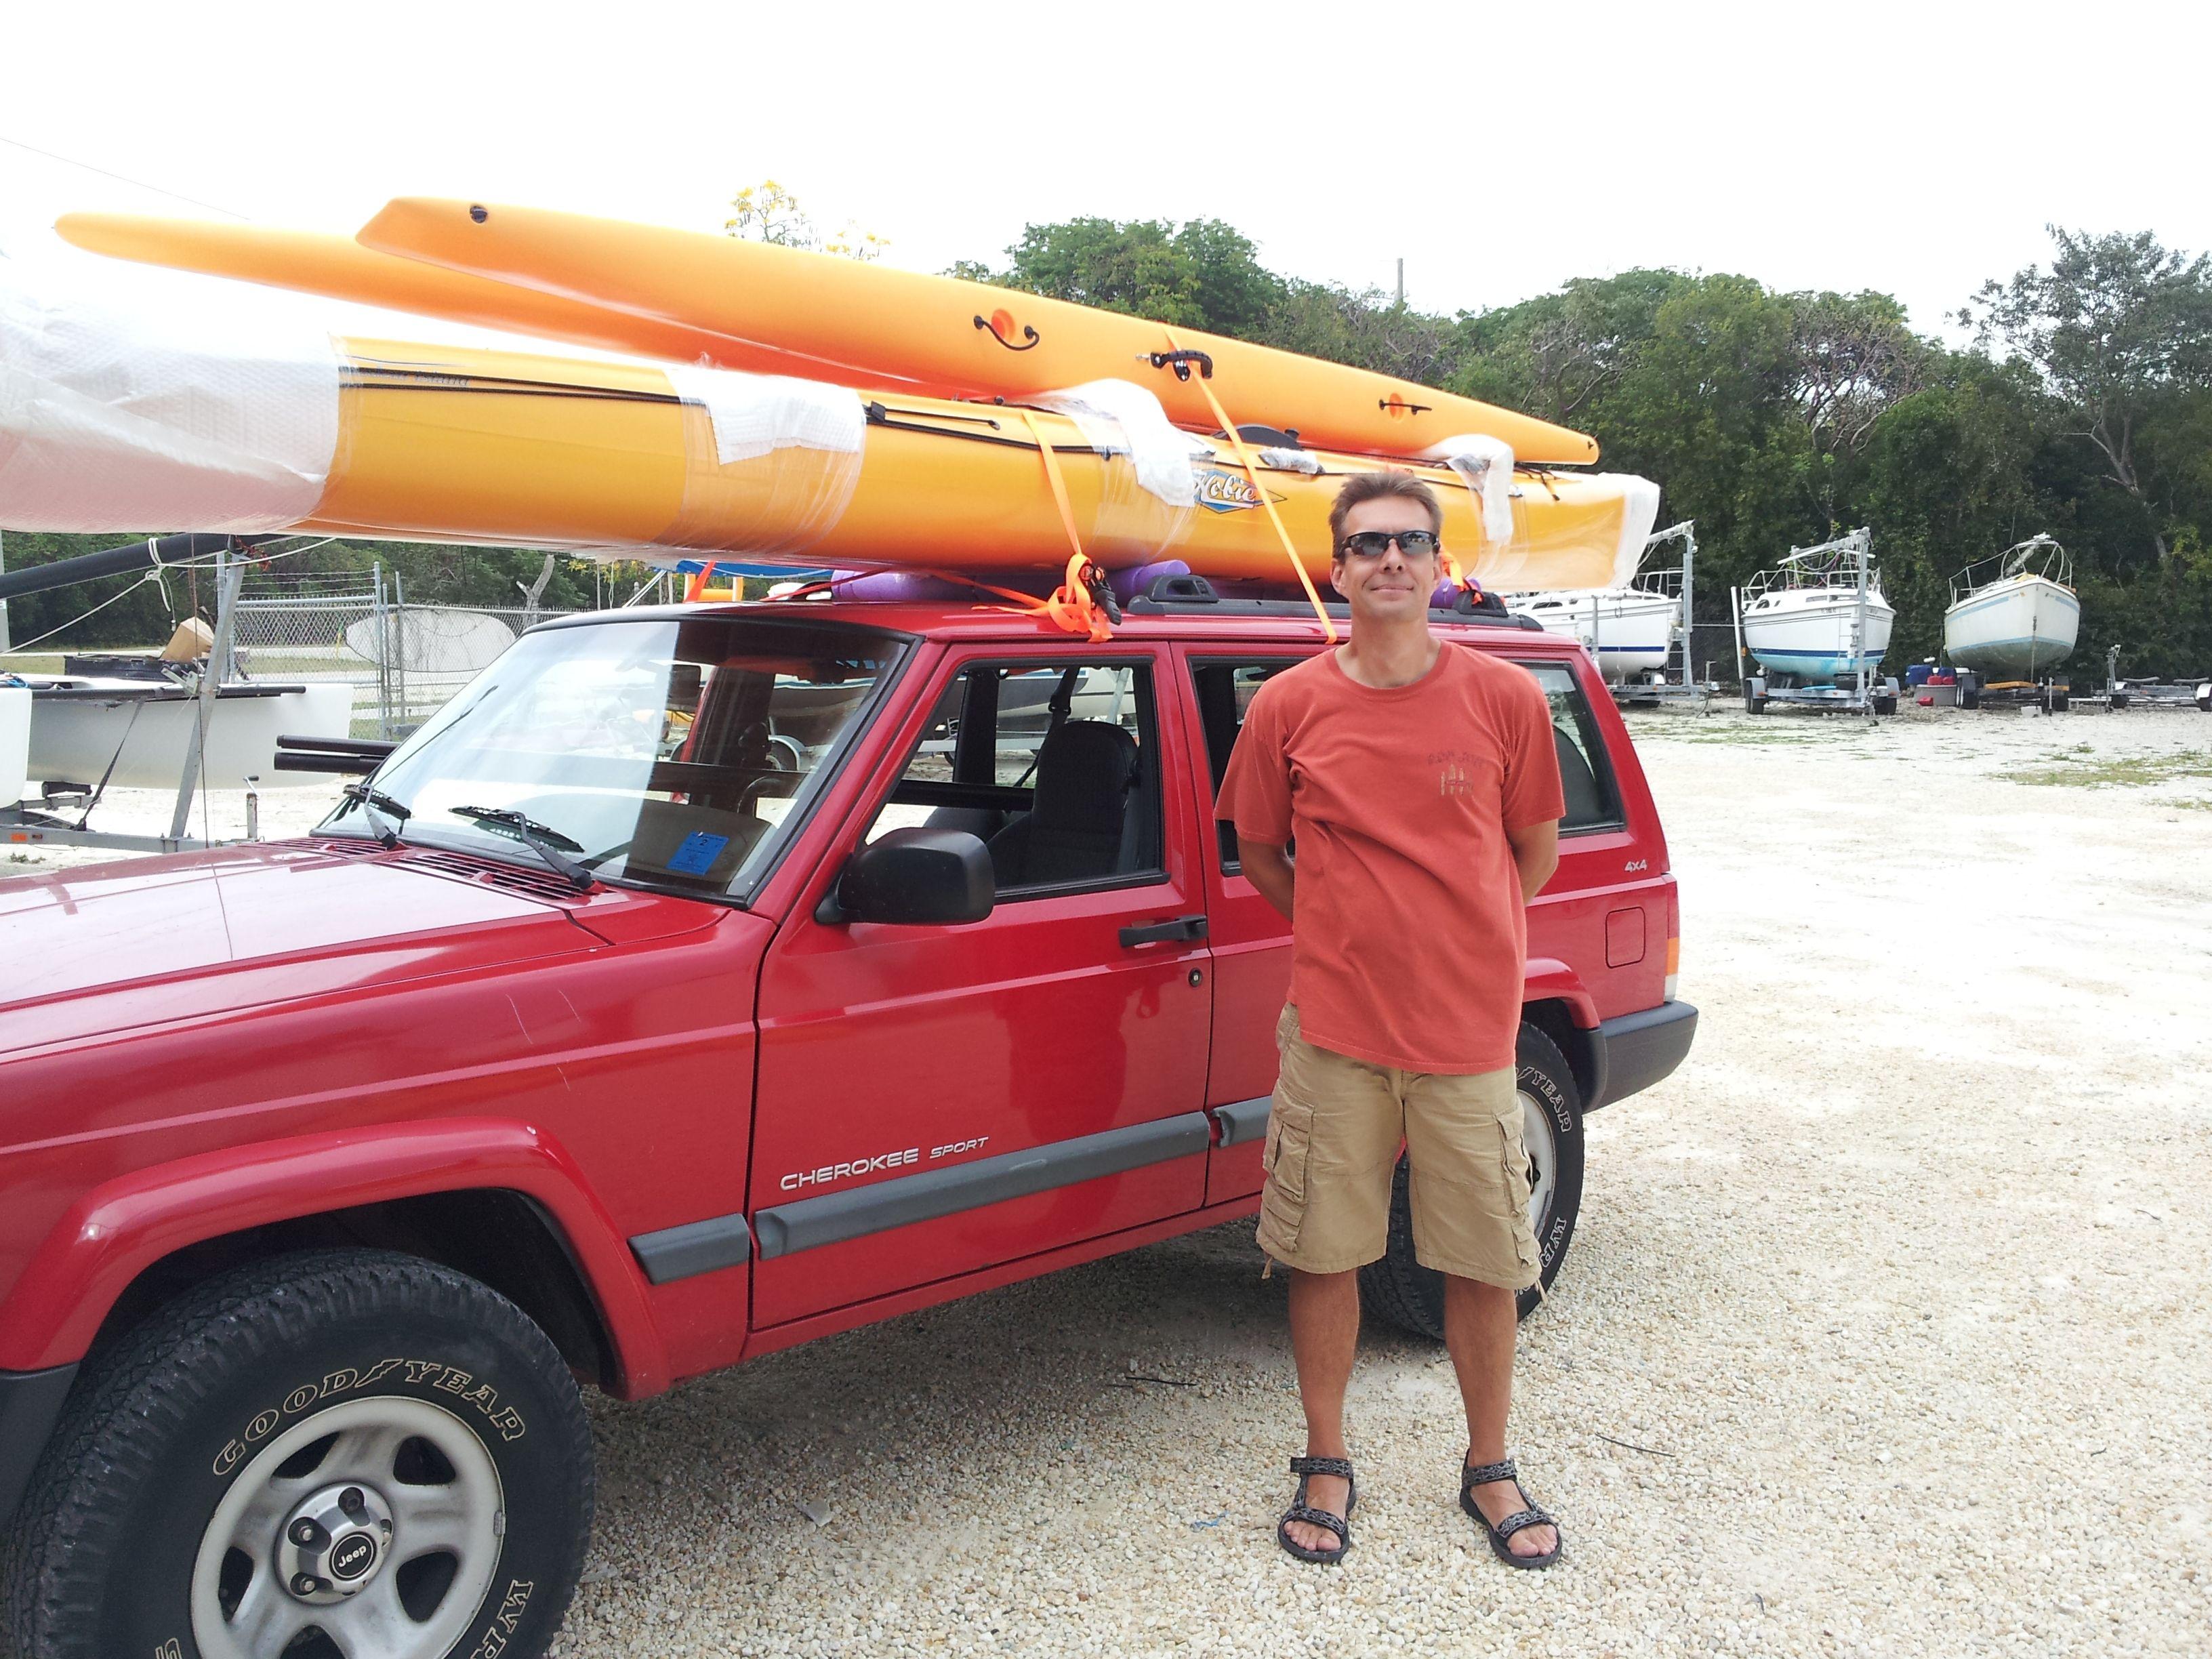 Car Topping A Hobie Island On A Cherokee Hobie Tandem Island Small Boats Water Sports